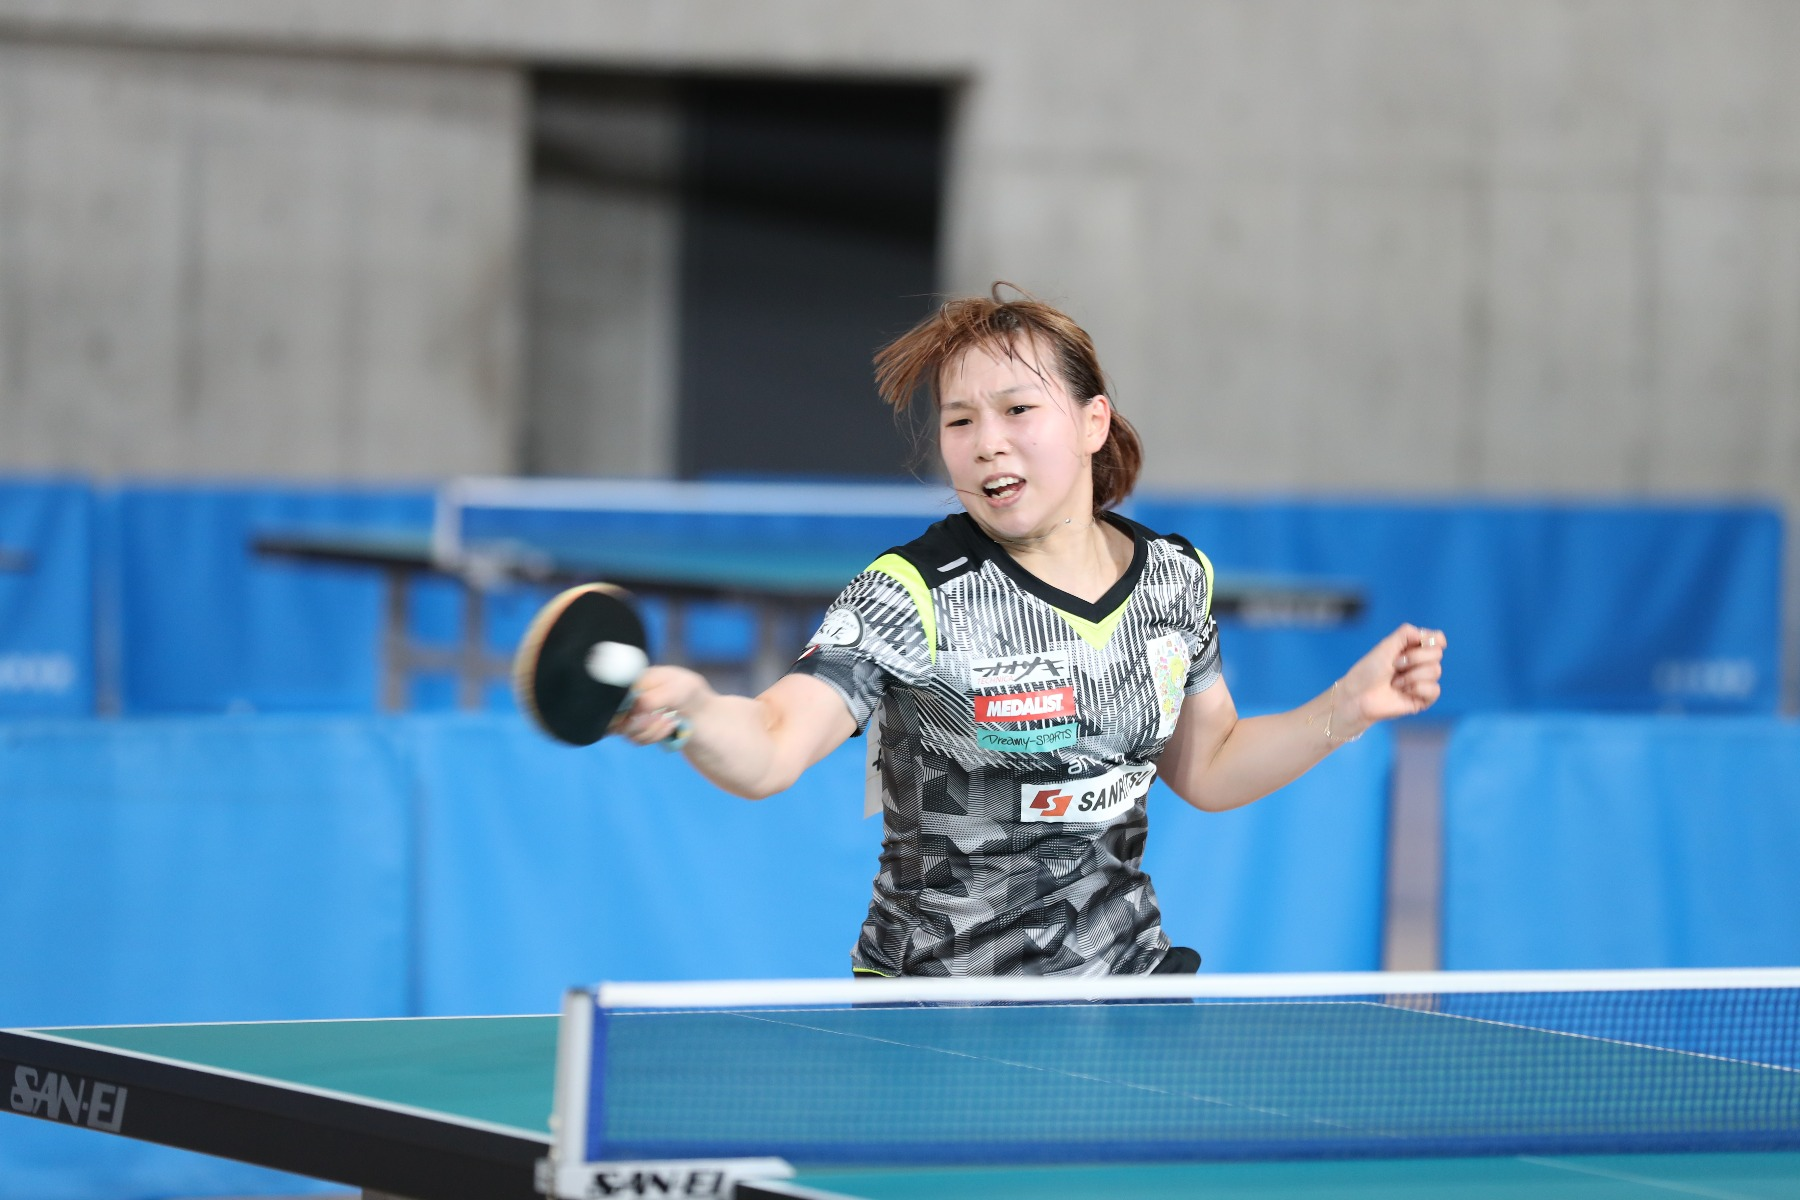 VICTAS 卓球 VICTAS JOURNAL 東京優勝大会 女子シングルス 優勝 松平志穂